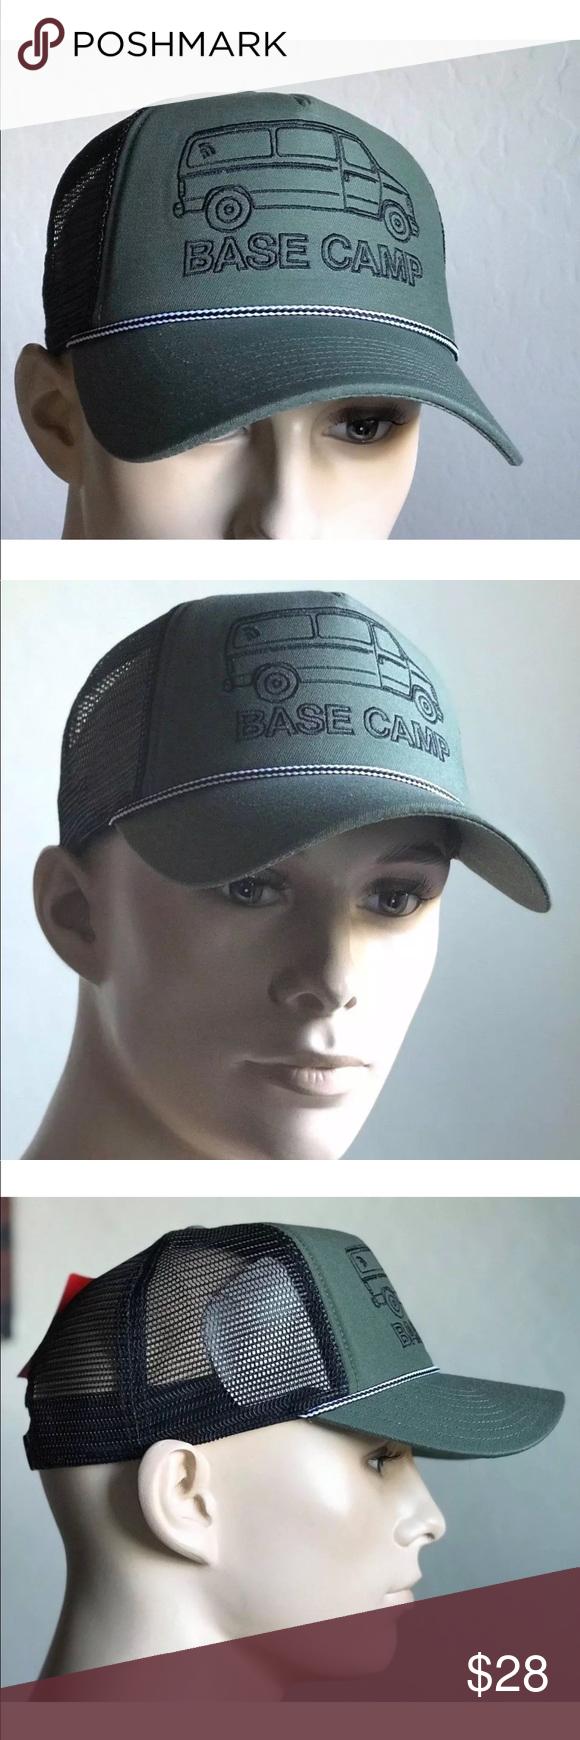 794fefcc9bc The North Face Men s Cross Stitch Trucker Hat AUTHENTIC The North Face  Cross Stitch Trucker Hat